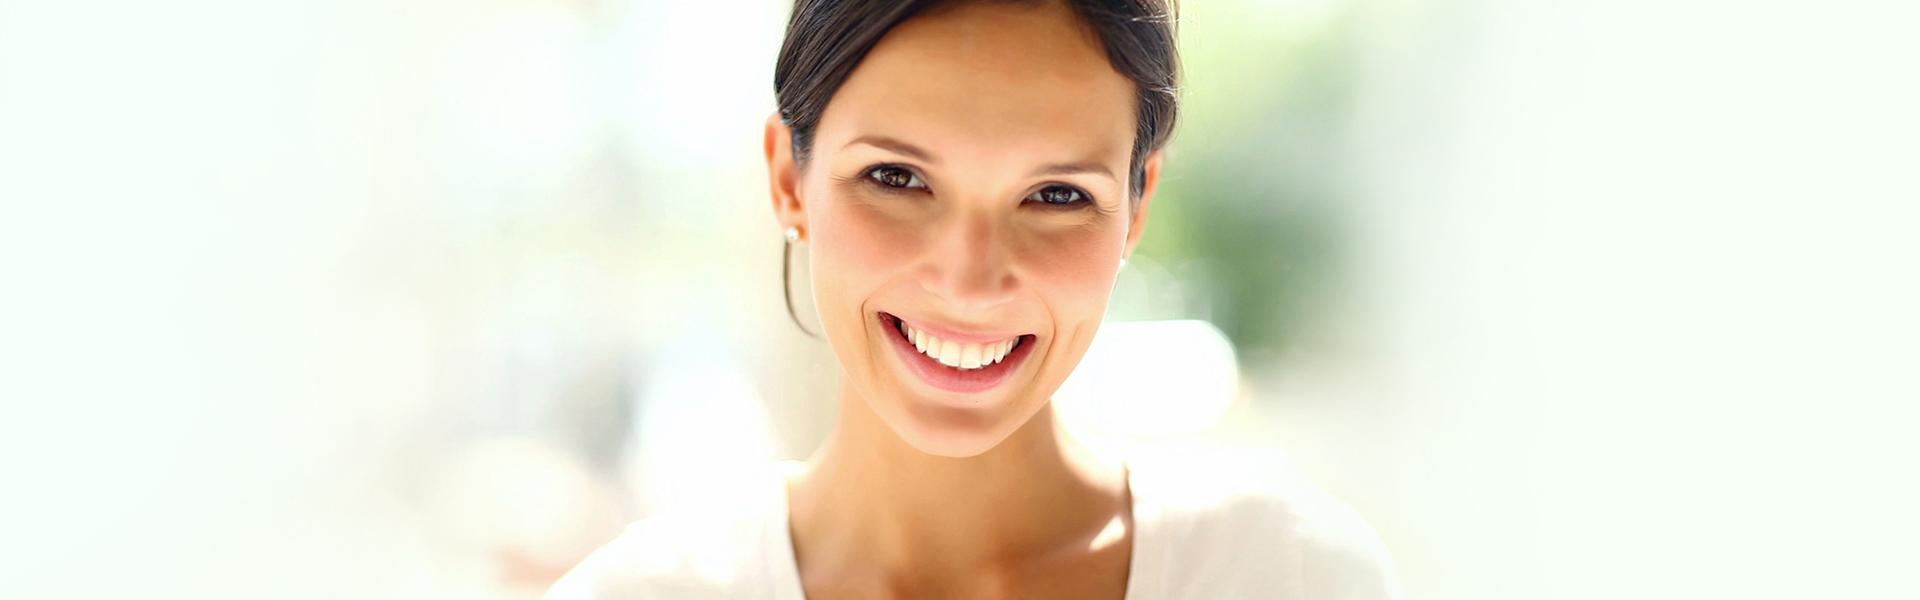 Dental Bridges FAQS